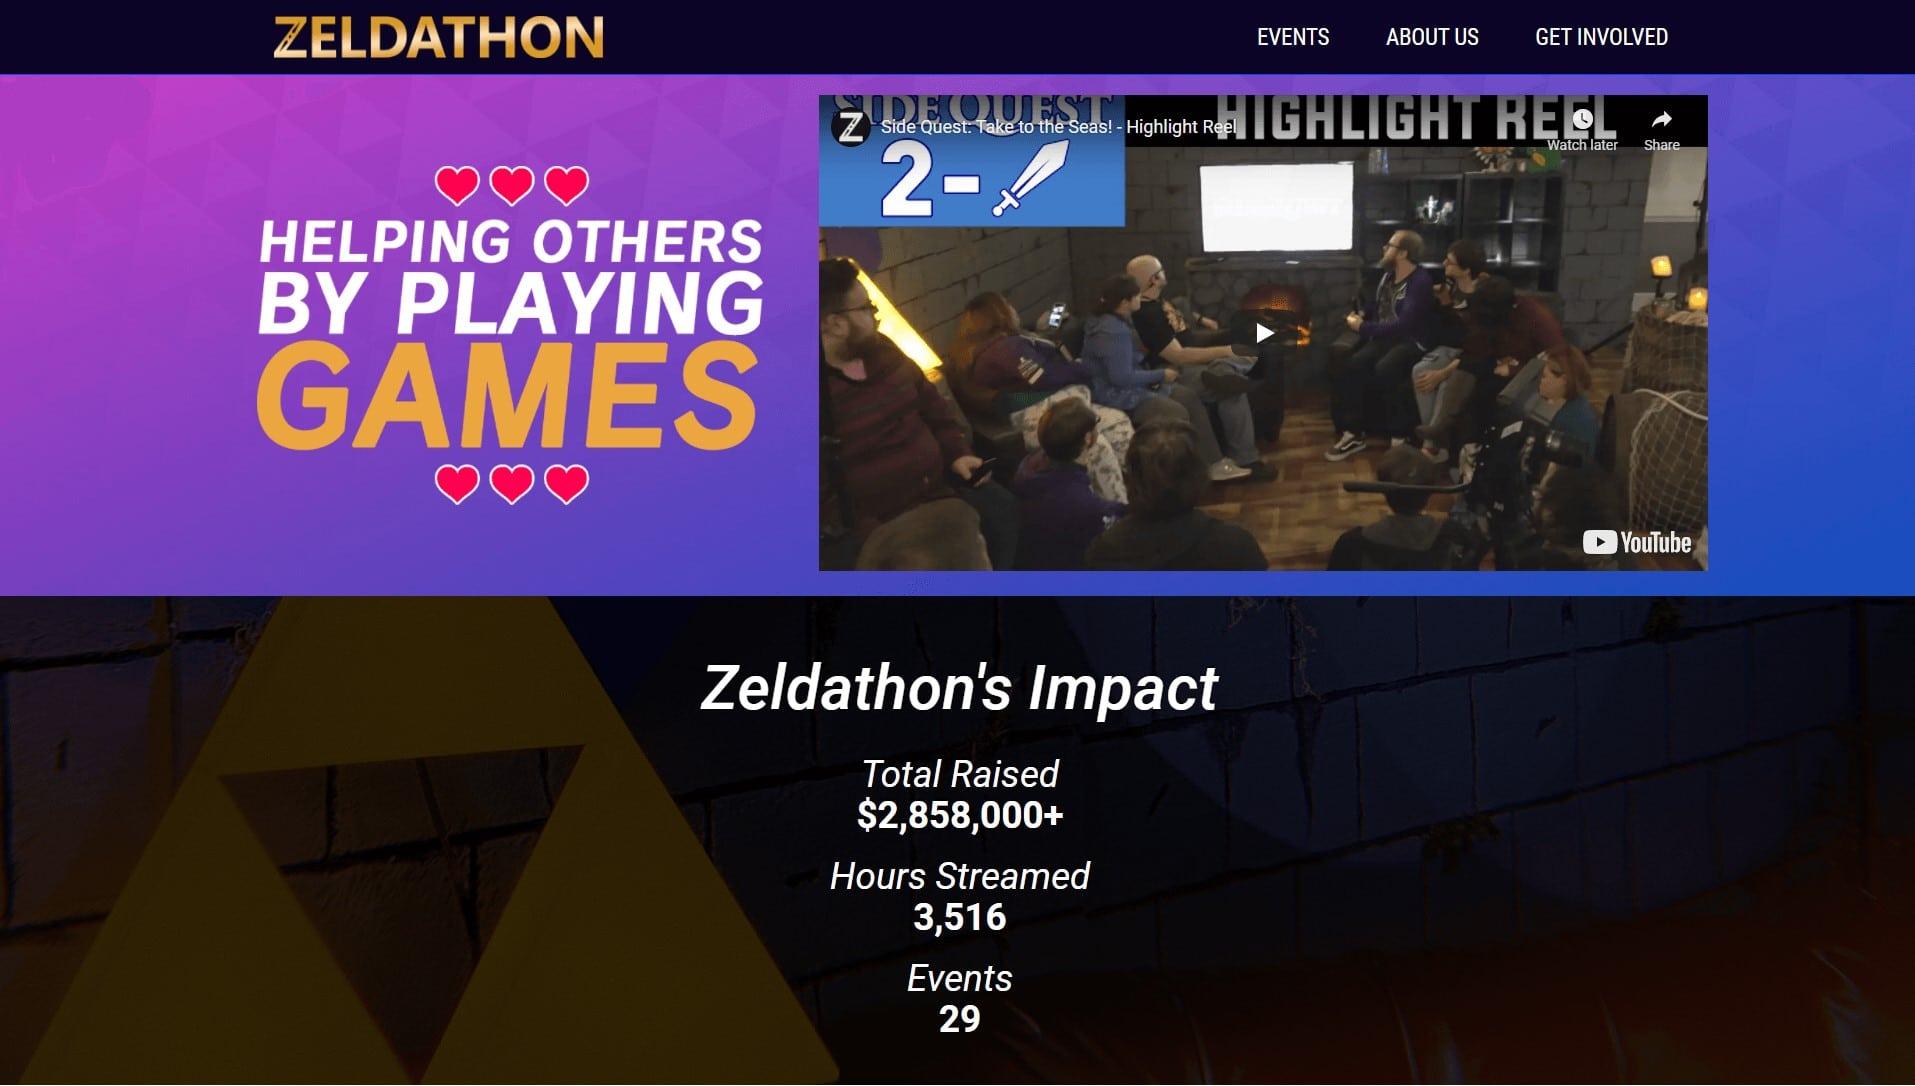 Zeldathon